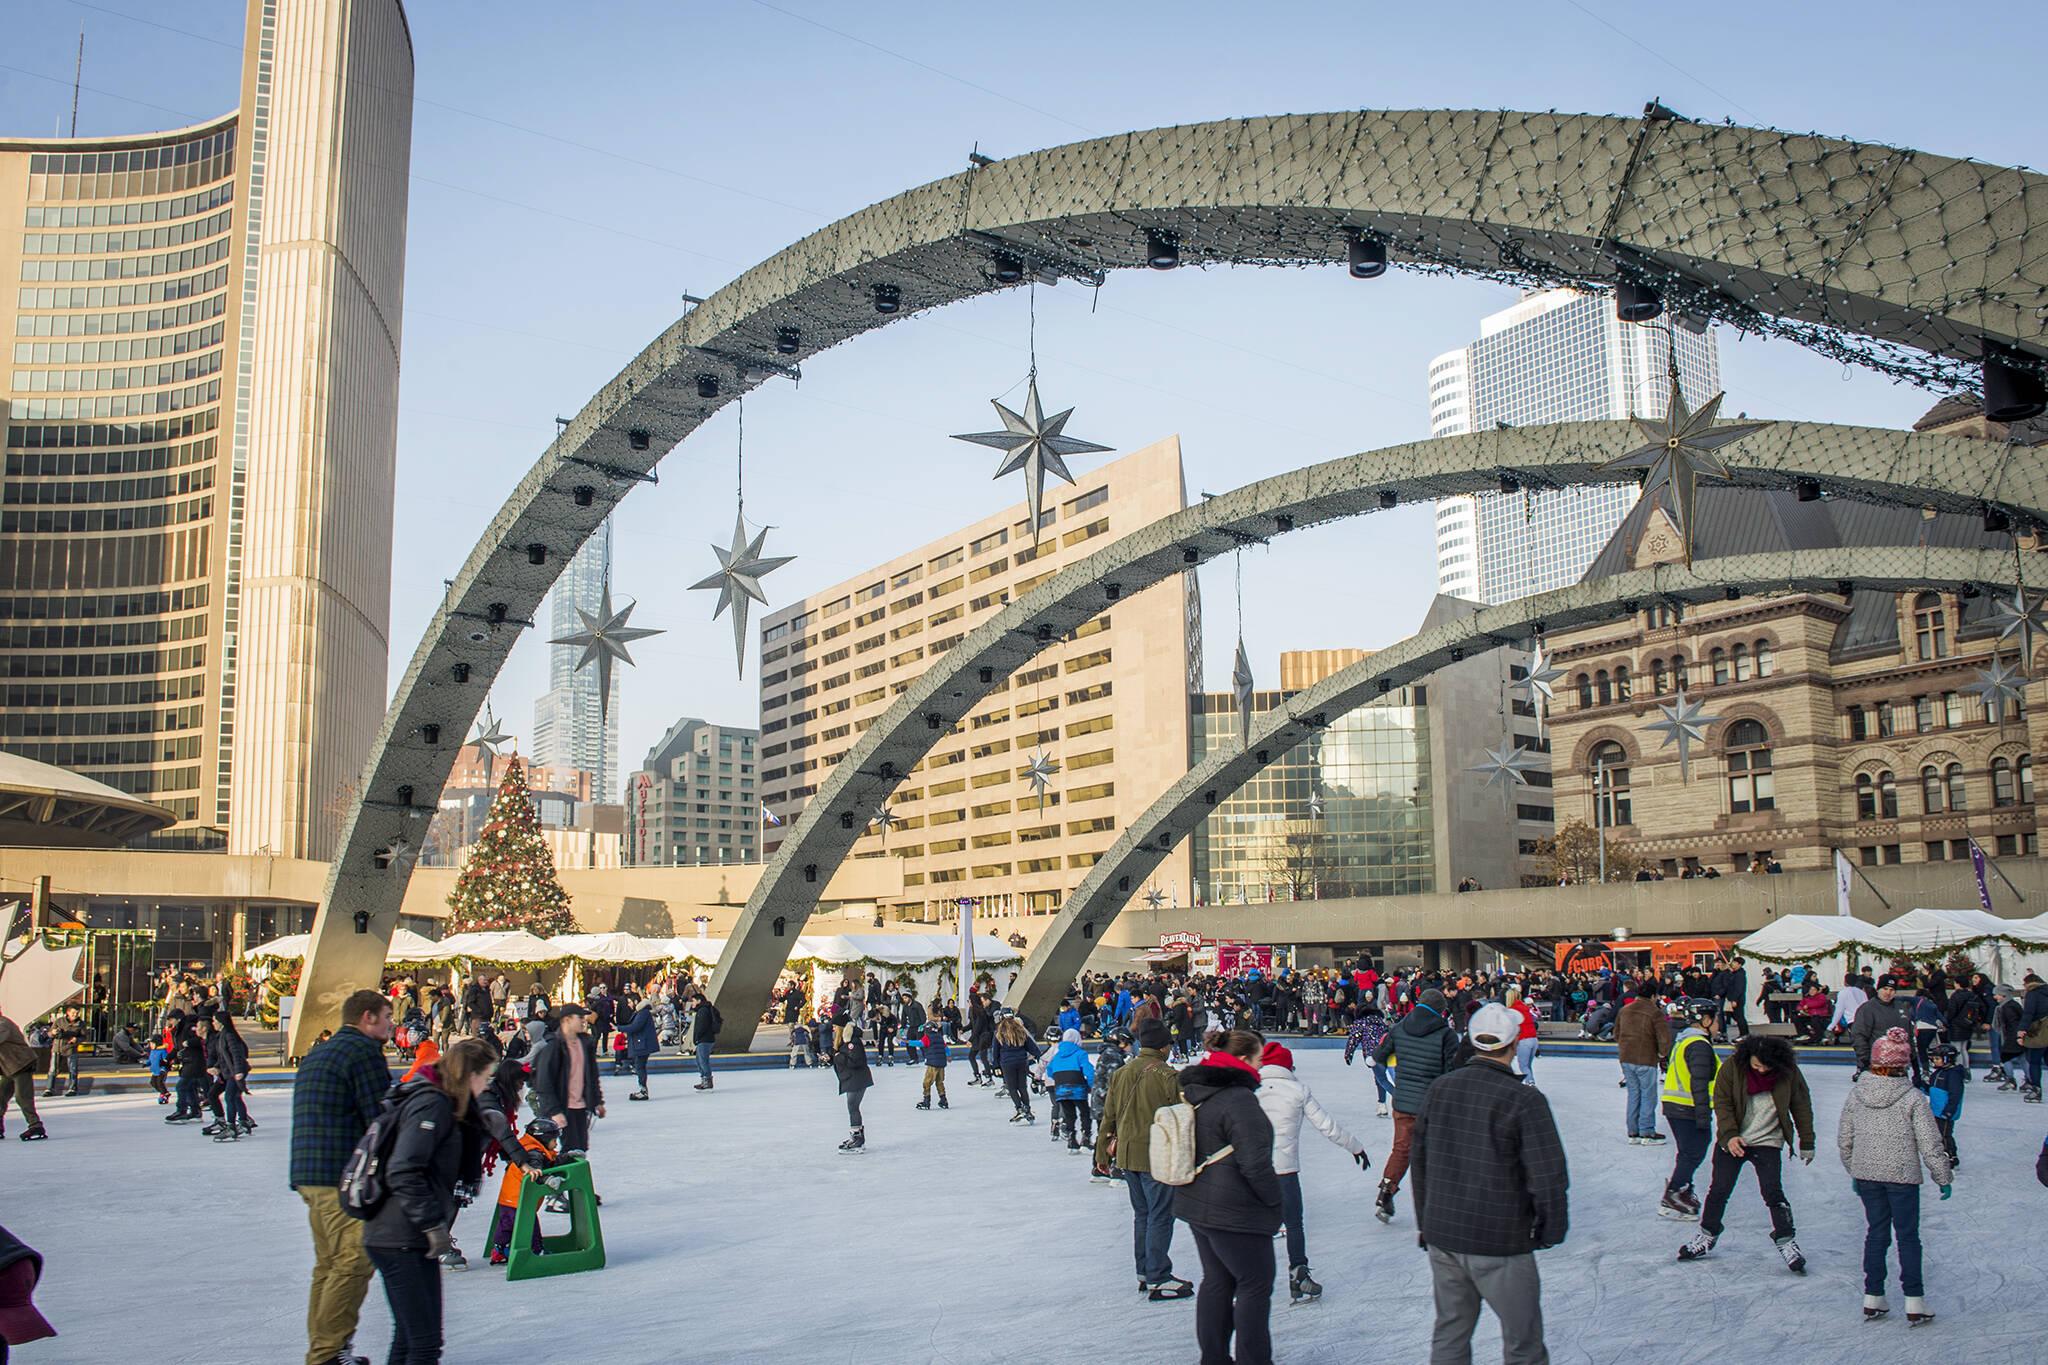 toronto skating rinks